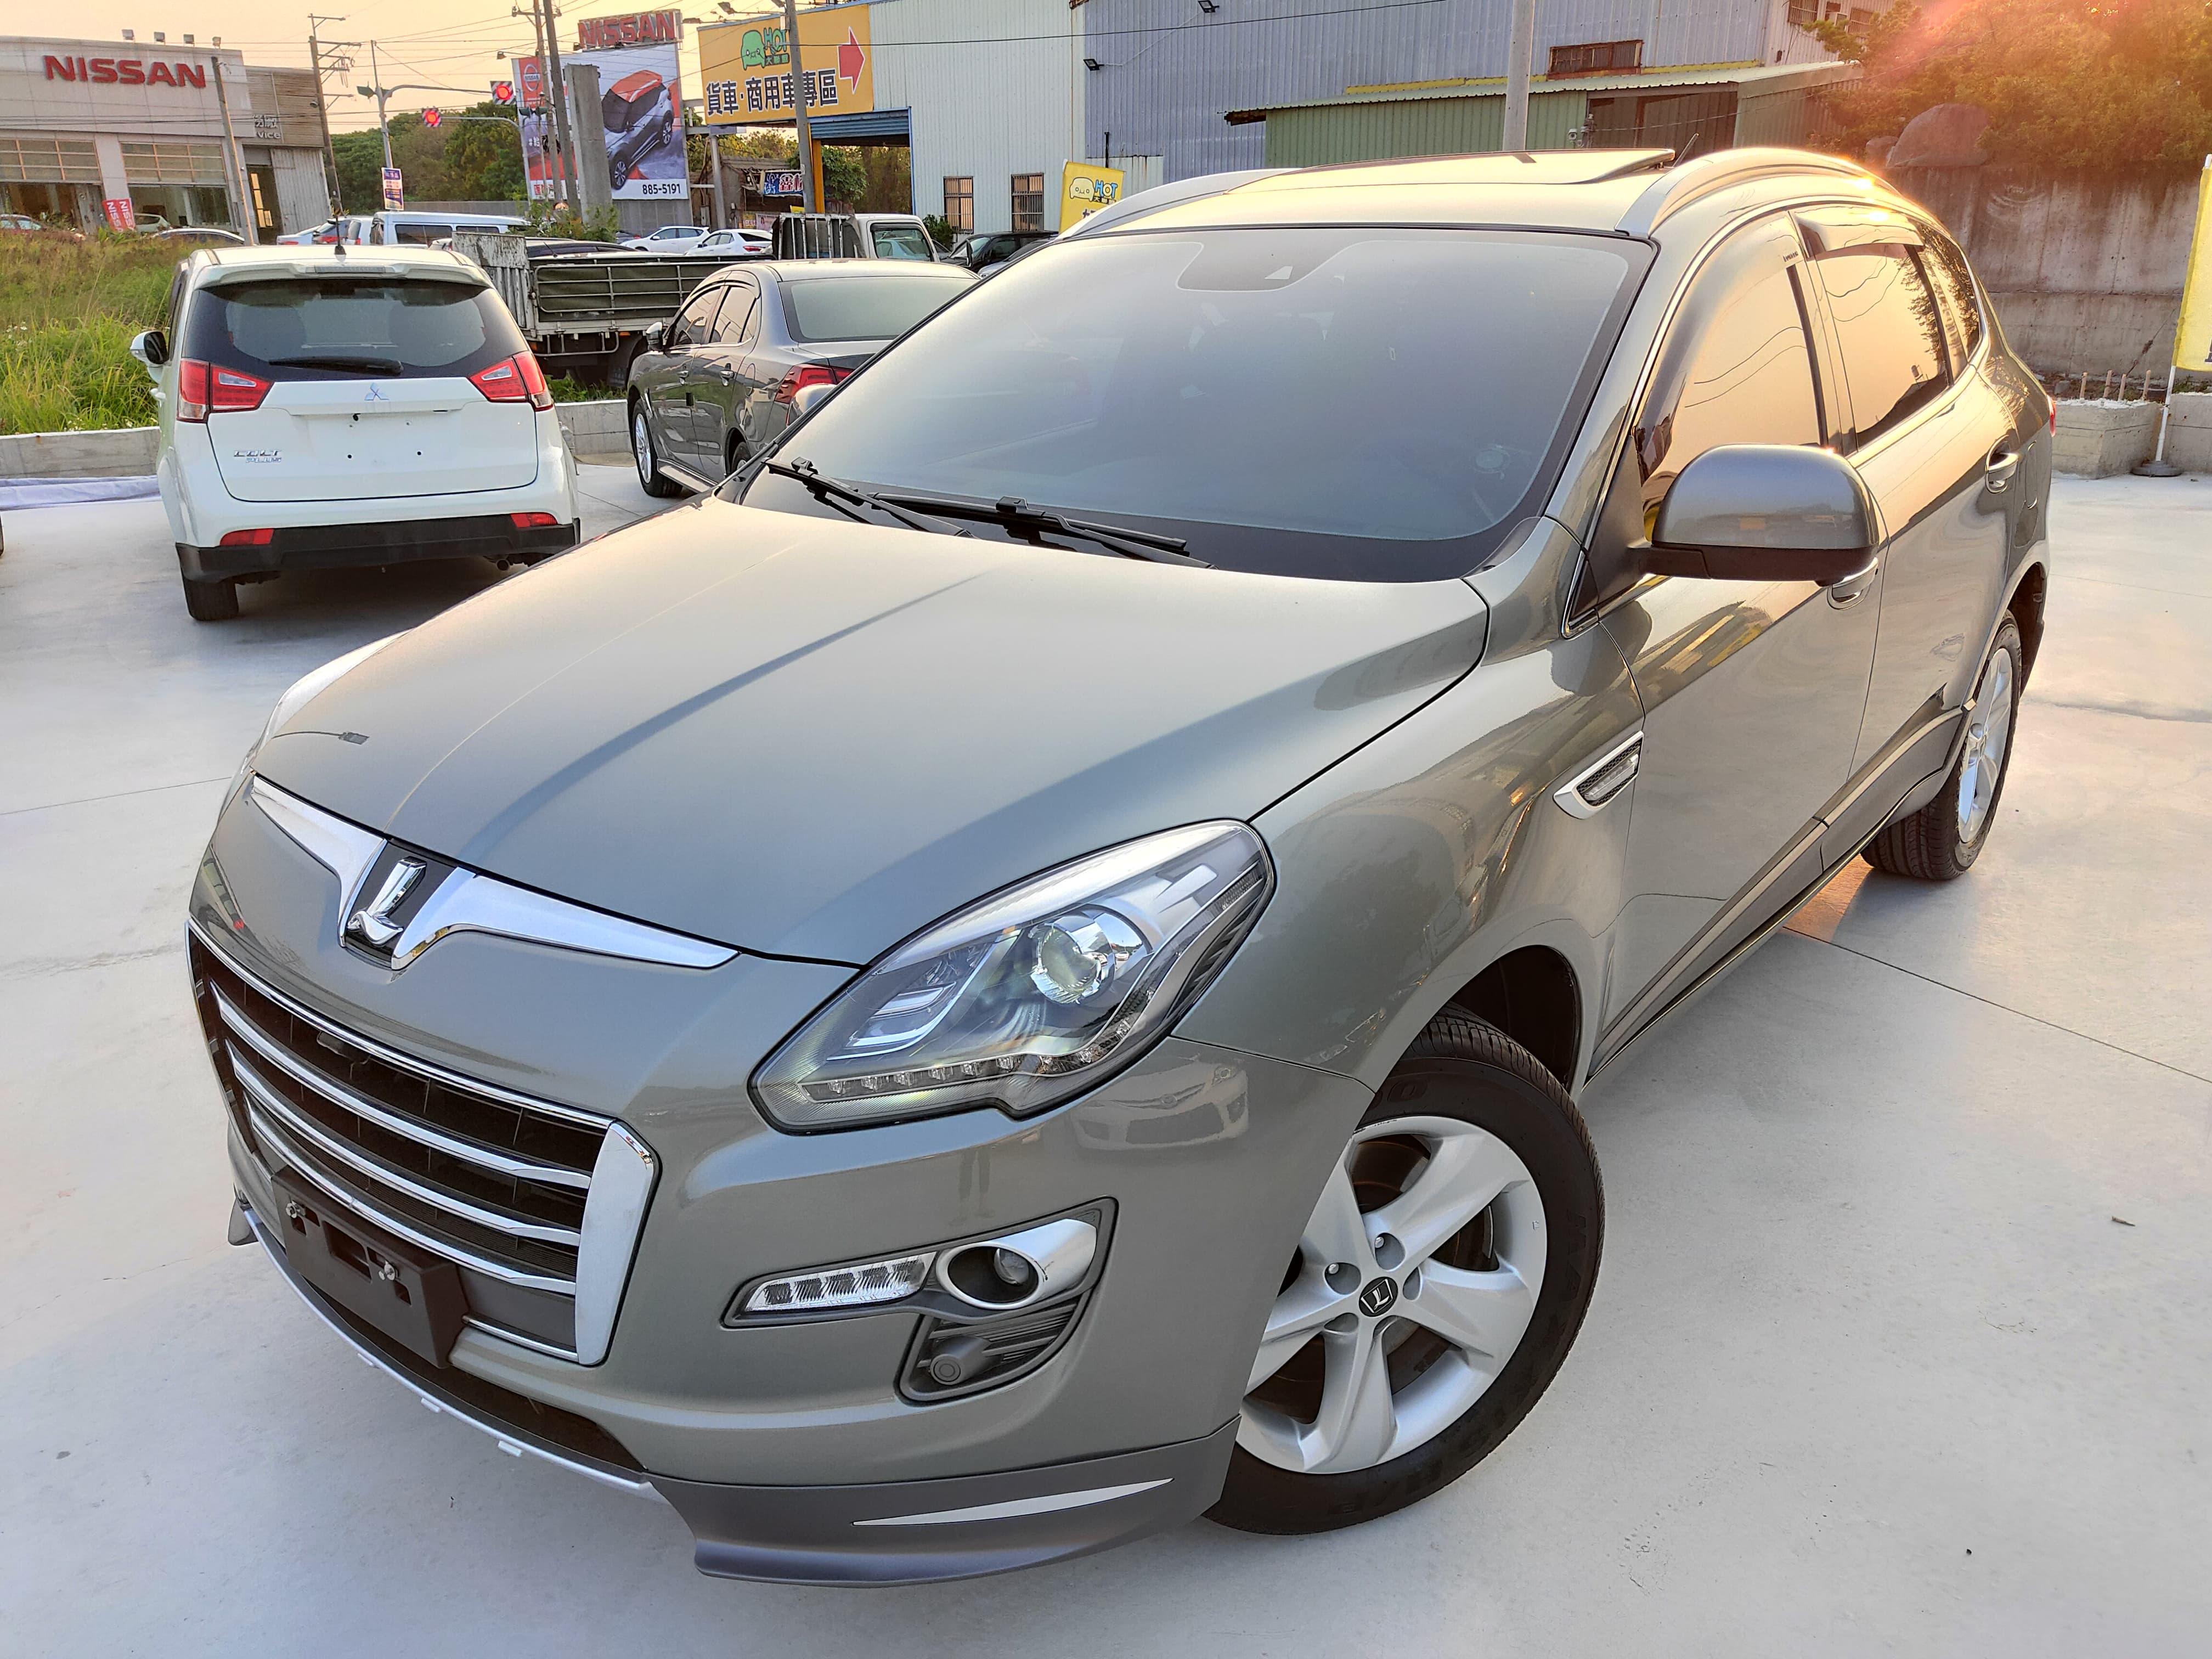 2013 Luxgen 納智捷 U7 turbo